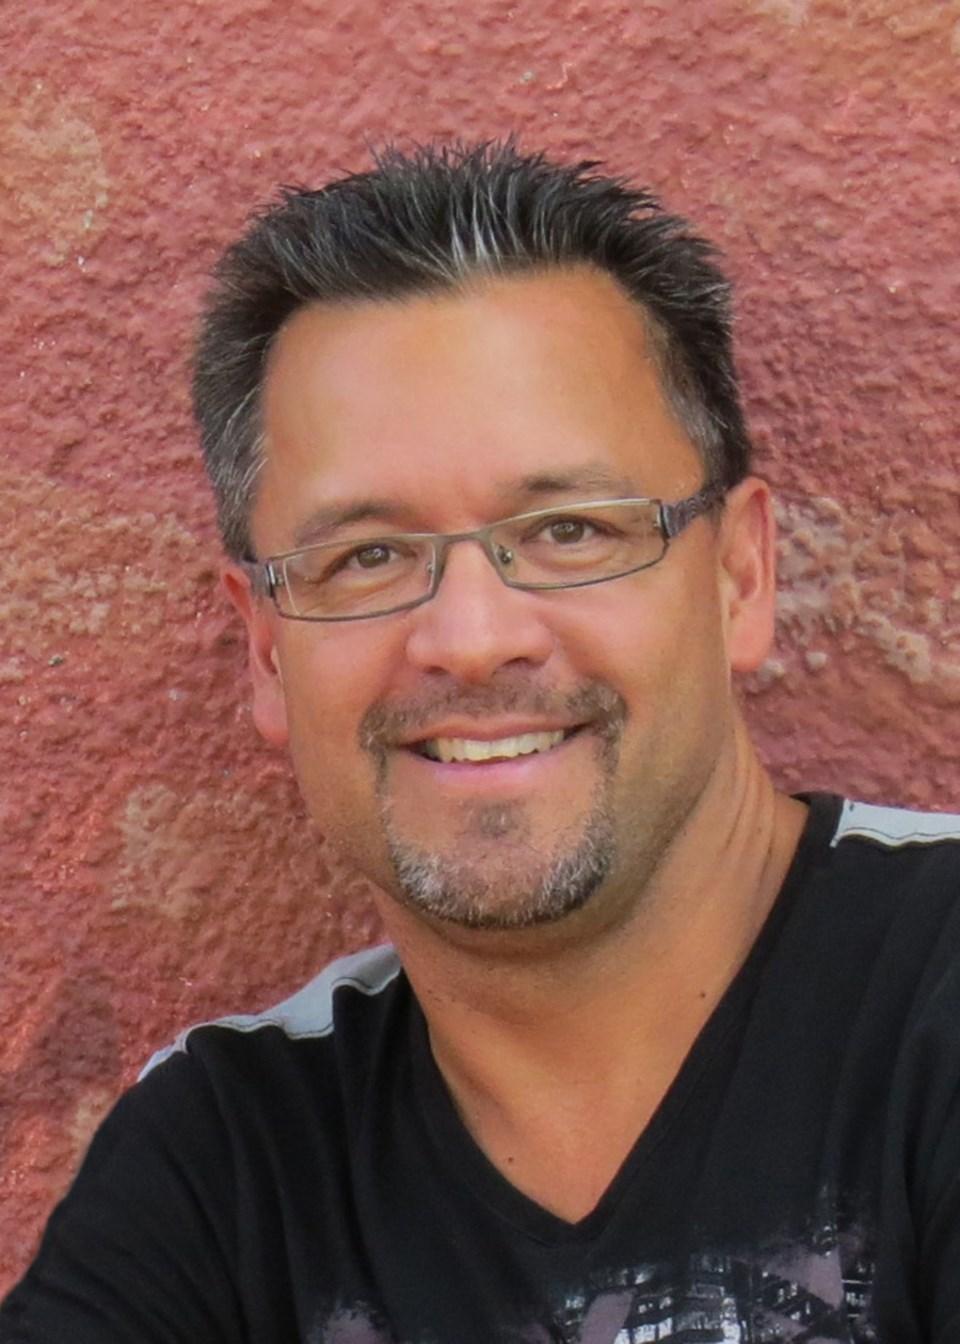 Greg Schurman